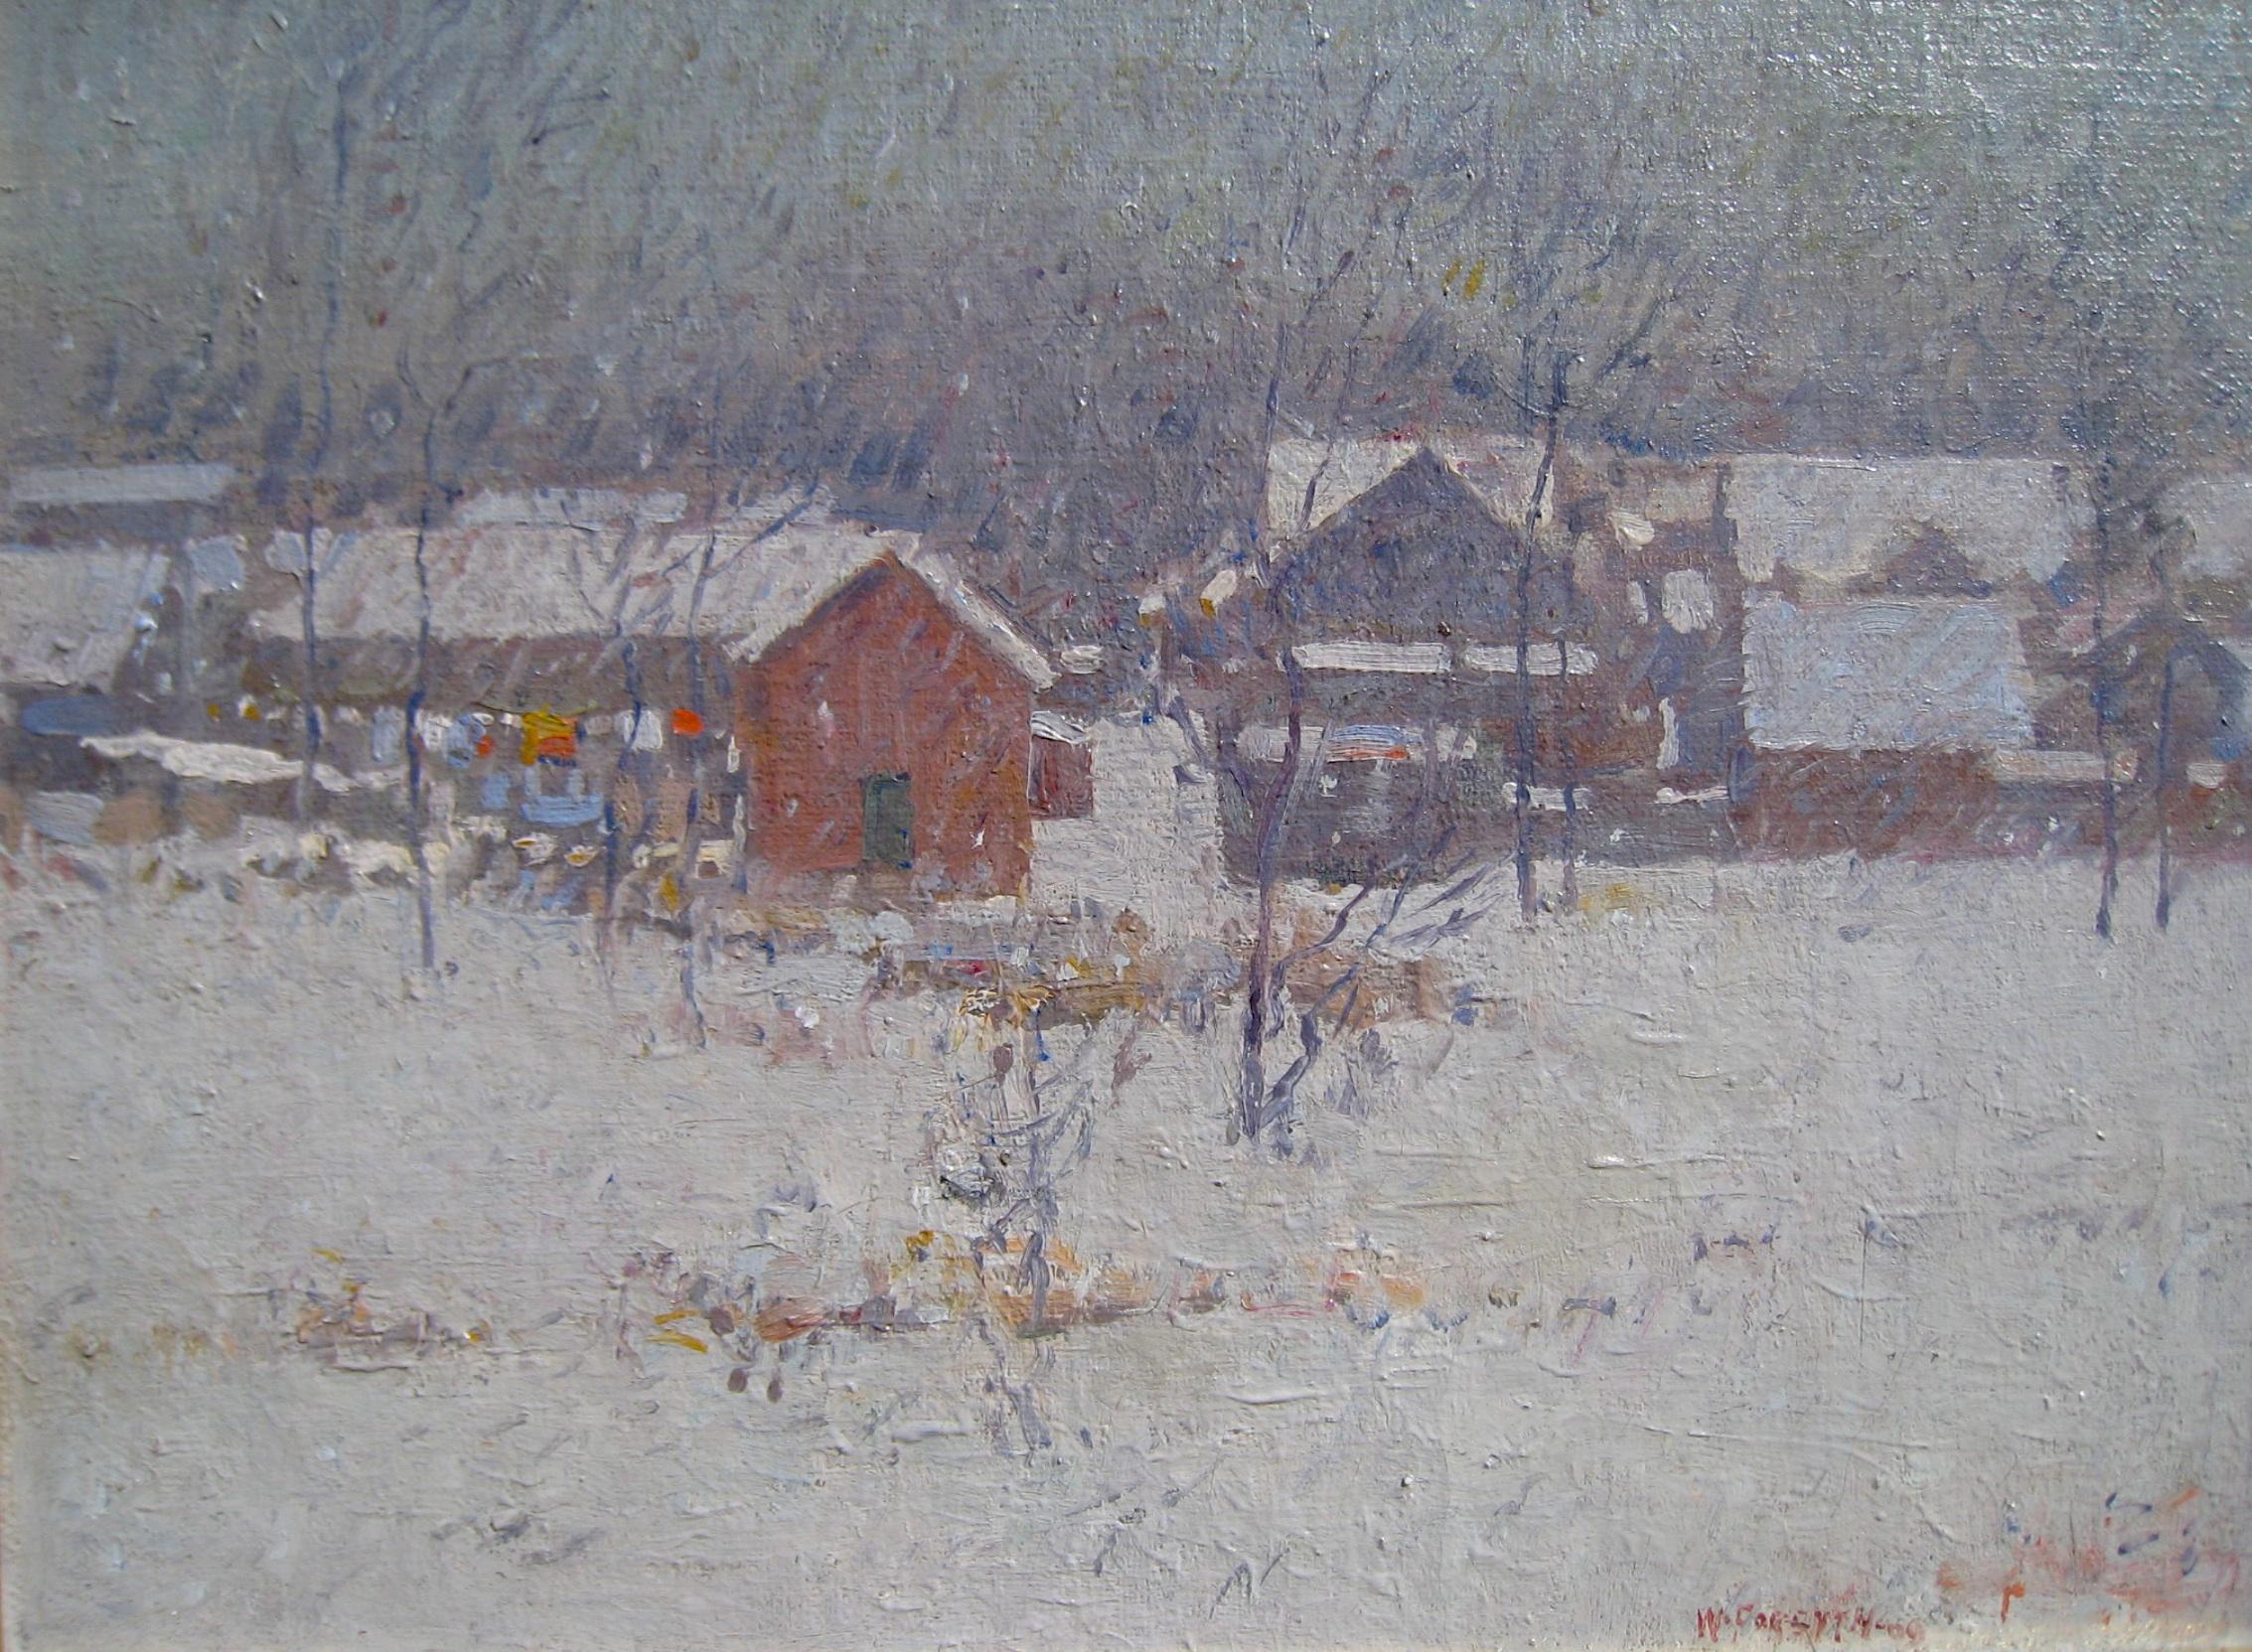 forsyth-winter-1909-cropped